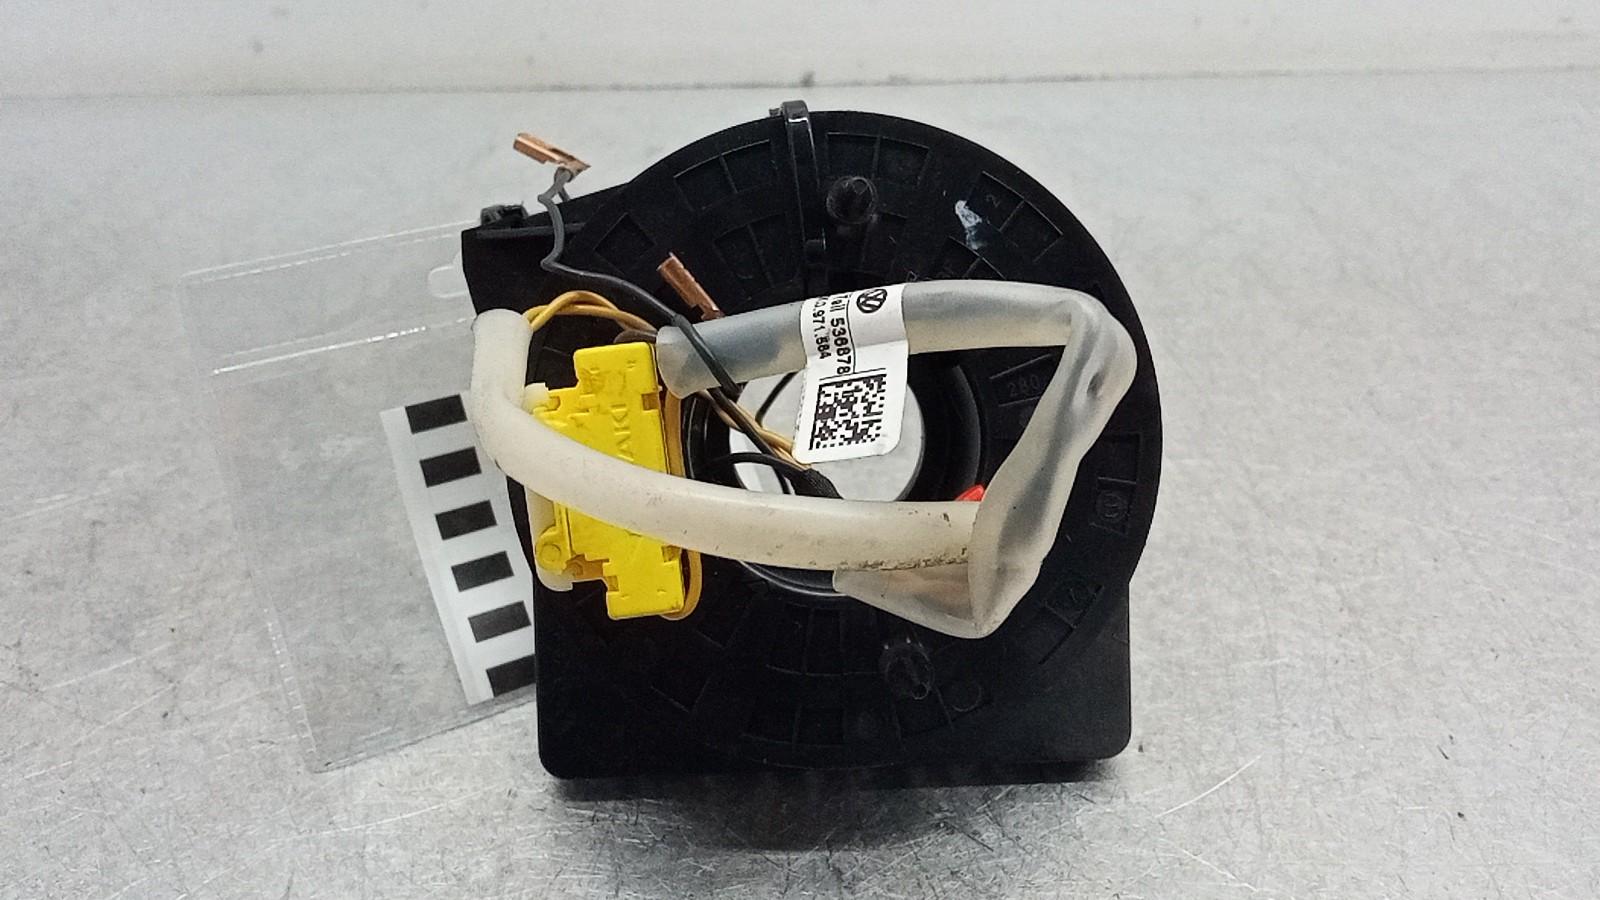 Fita Airbag (20402263).